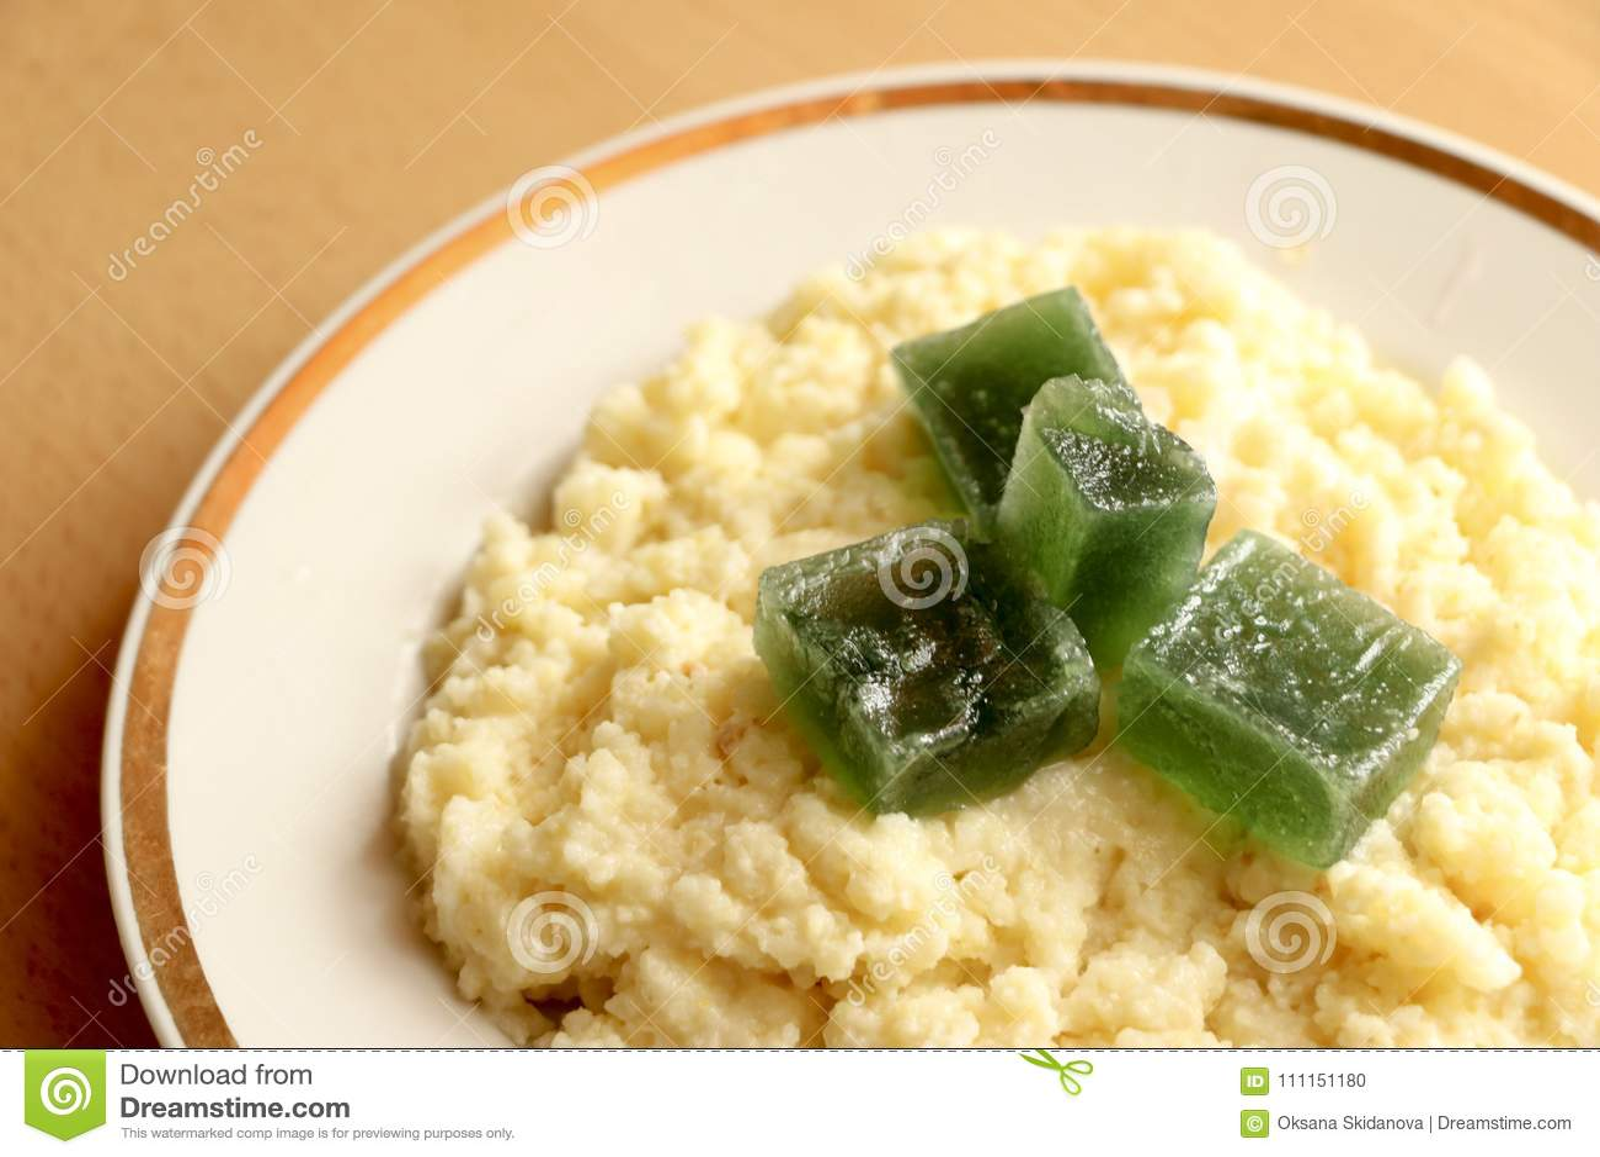 каша на завтрак полезная